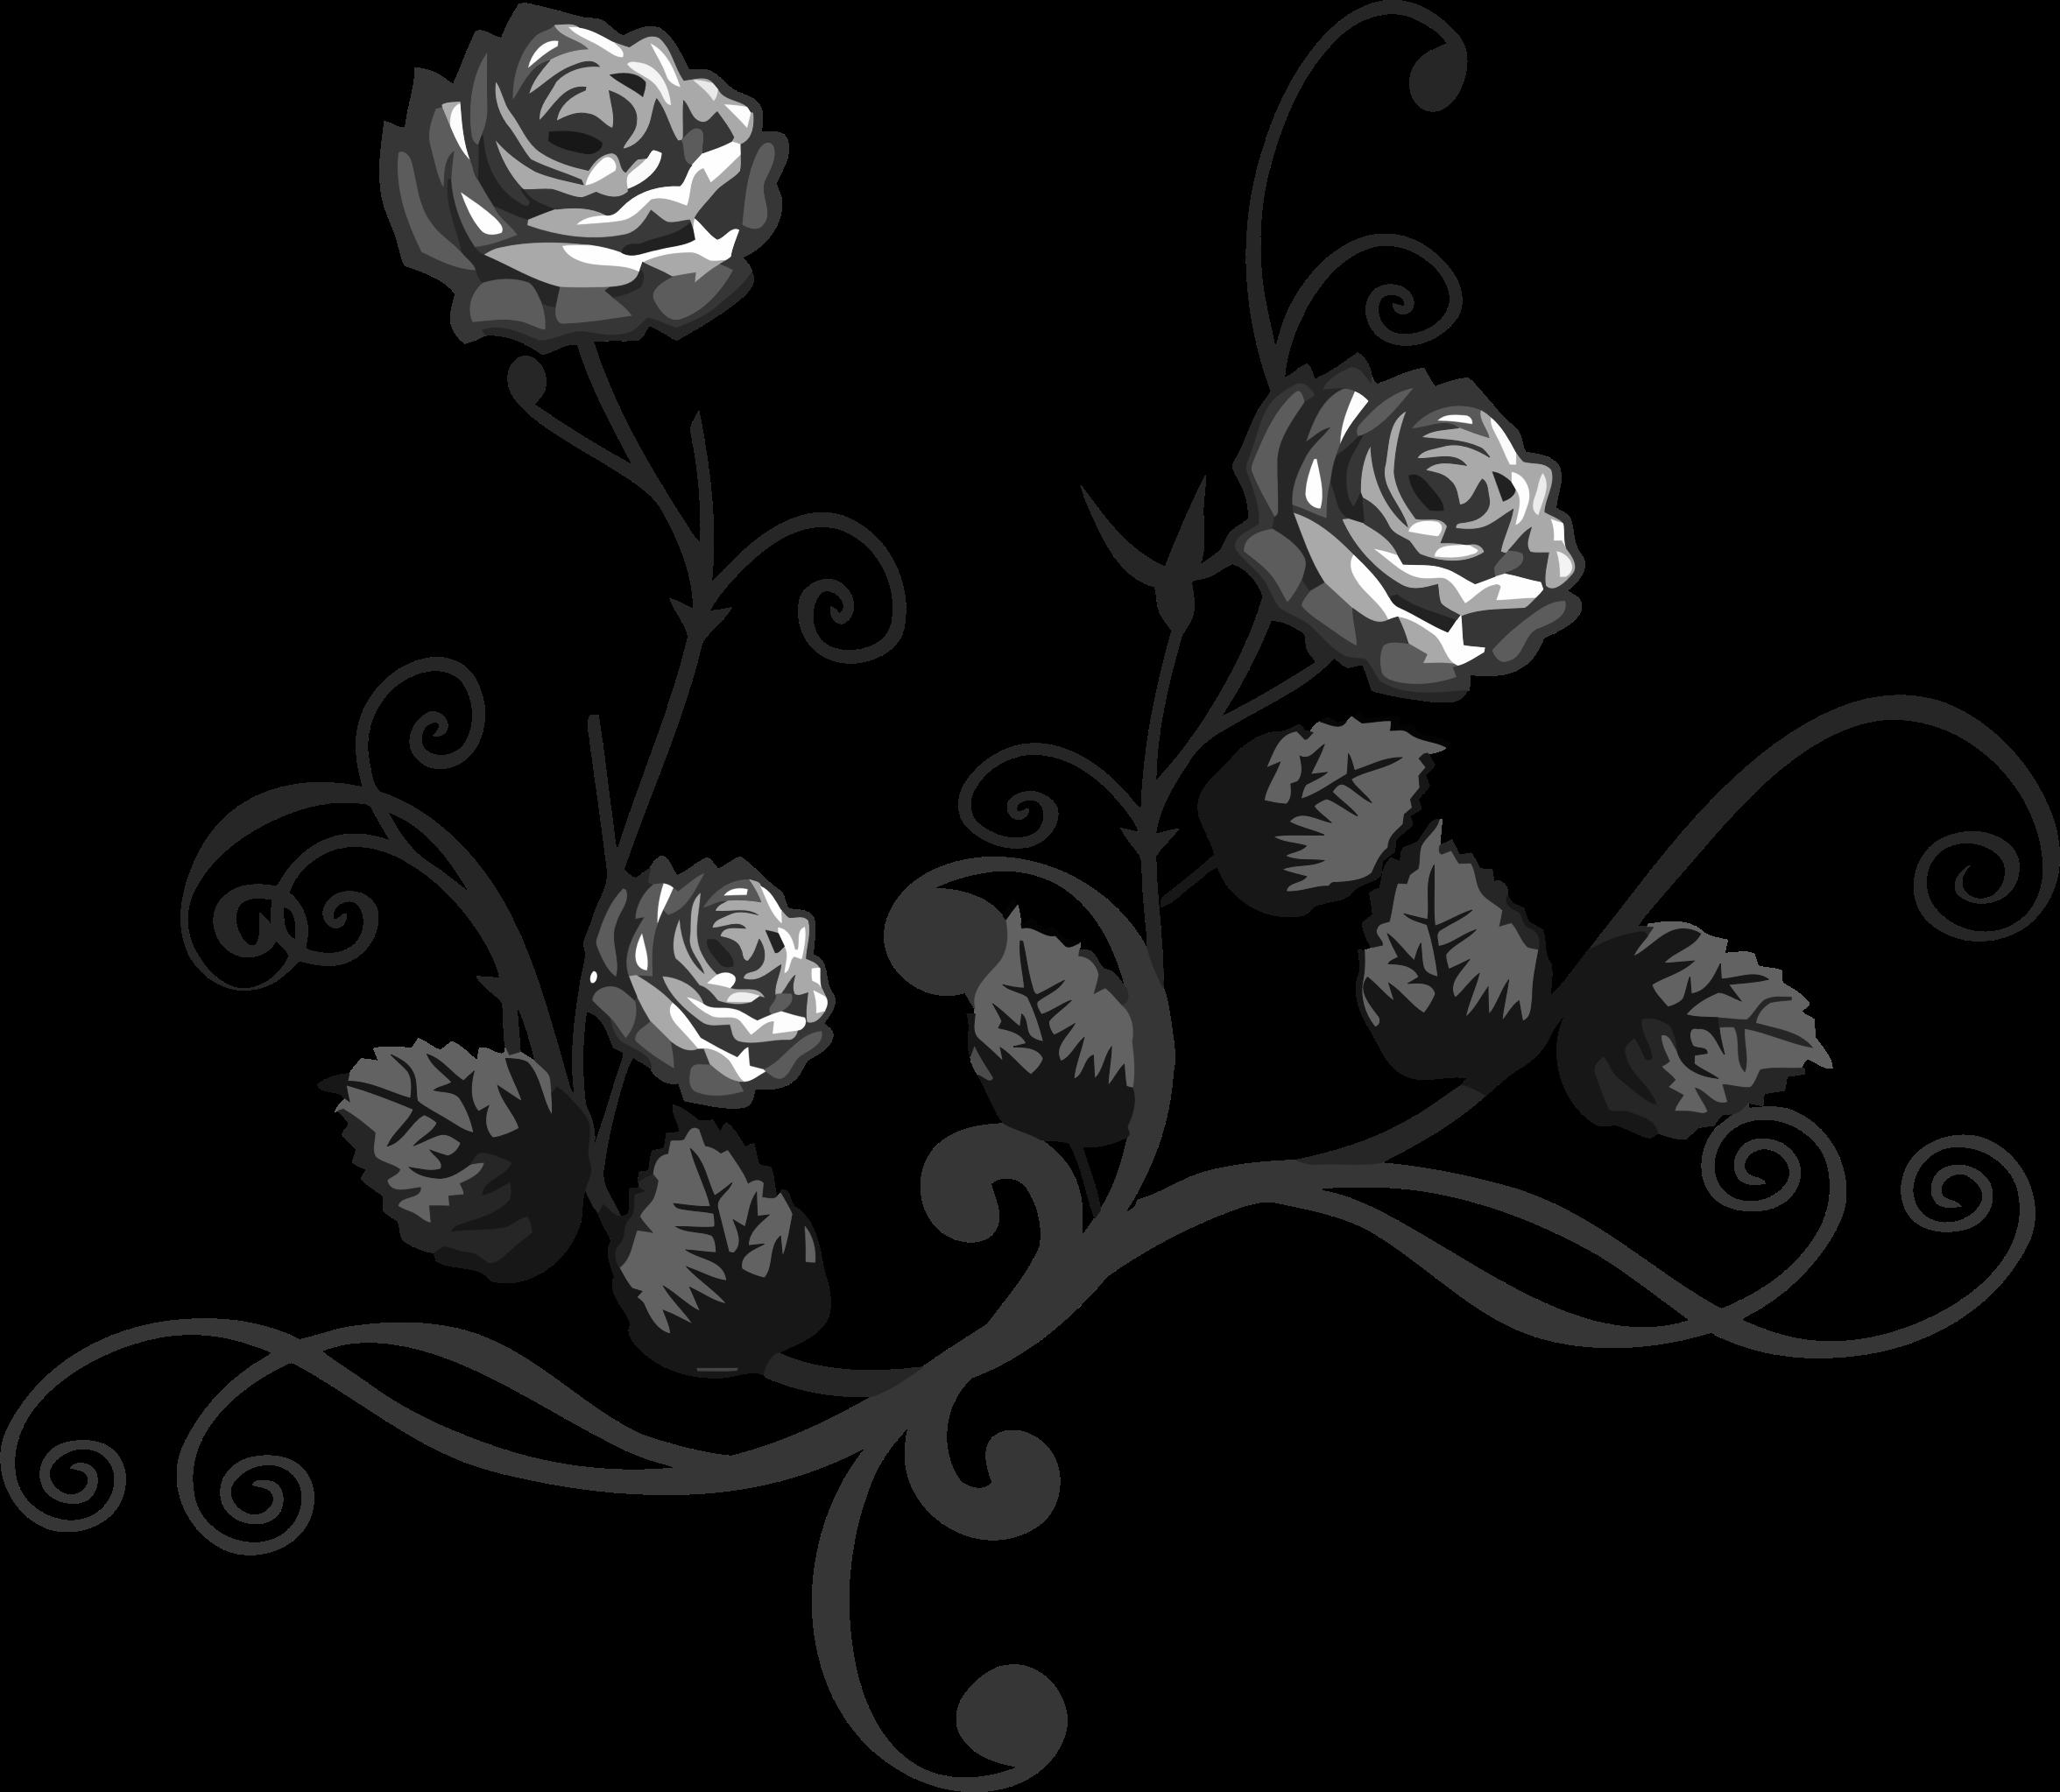 Flower flourish clipart image black and white download Clipart - Rose Floral Flourish 6 image black and white download